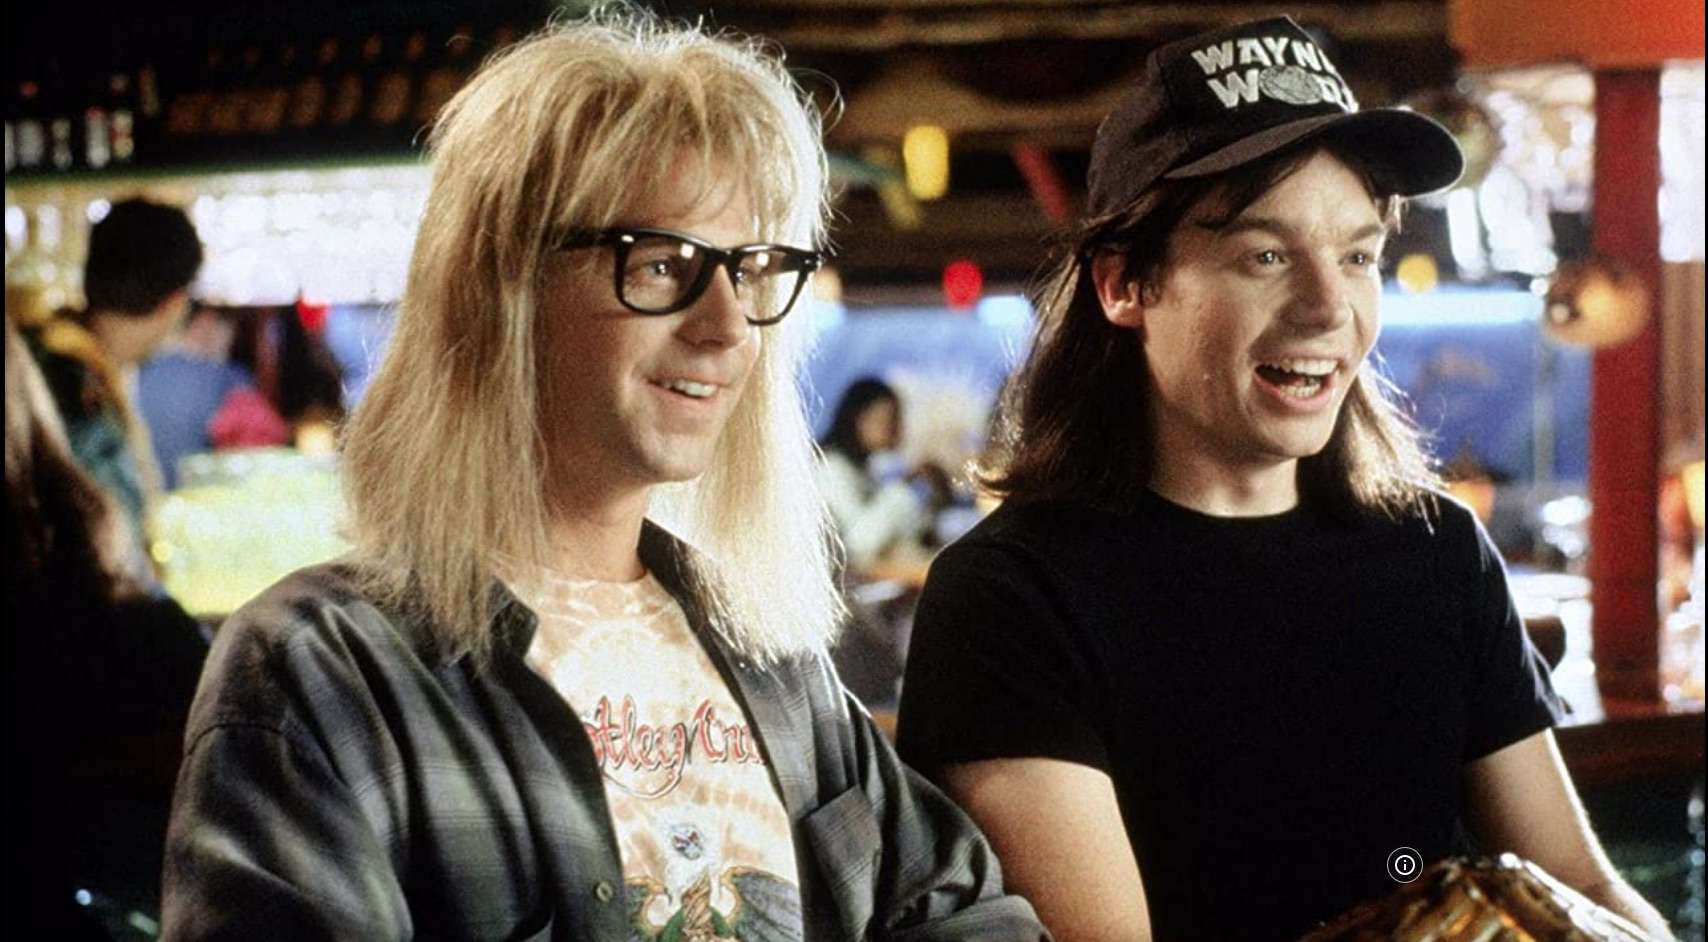 Wayne's World scene with Garth (Dana Carvey) and Wayne (Mike Meyers)